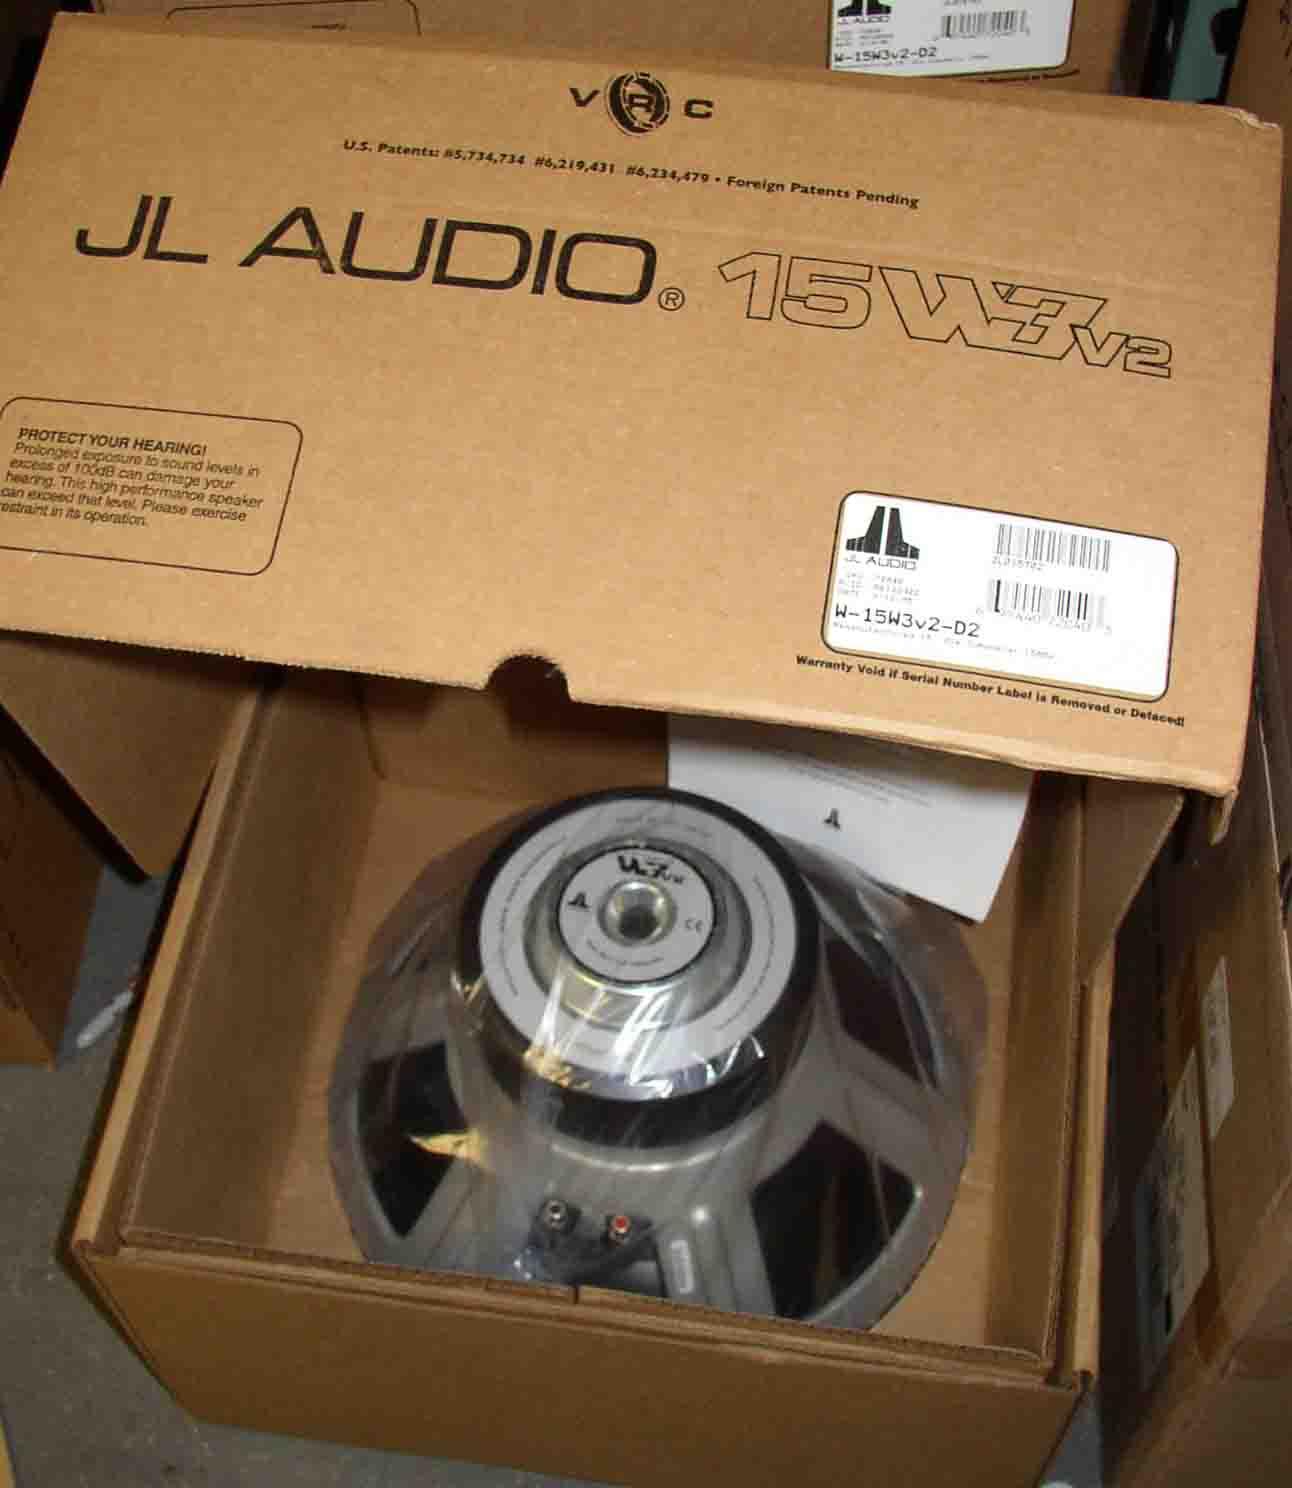 Jl Audio W3 Lookup Beforebuying Amp Wiring Schematics 10w3v2 15 Inch Subwoofer